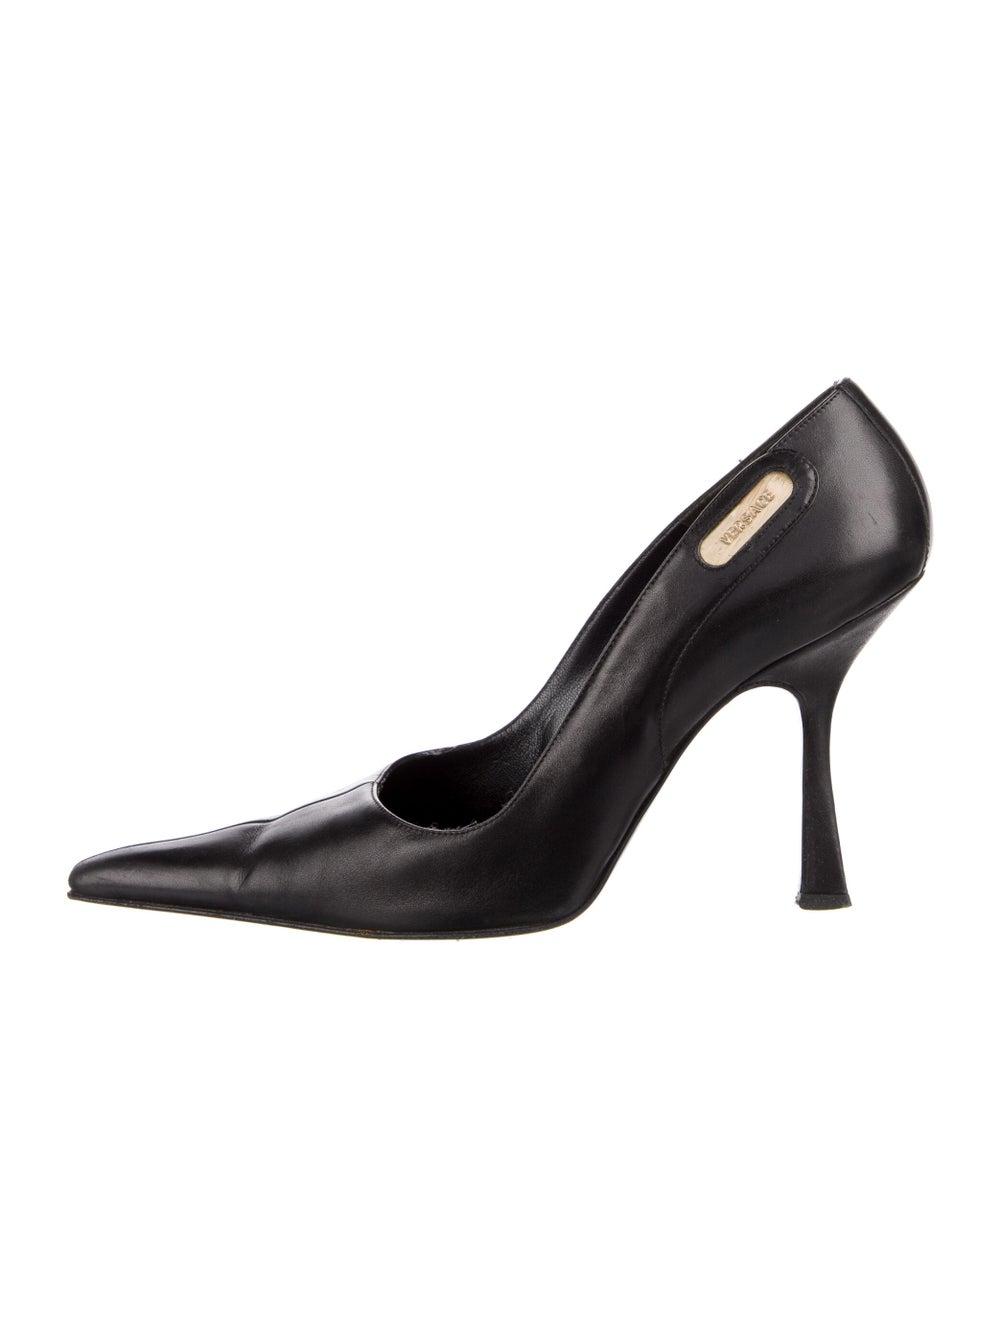 Gianni Versace Leather Pumps Black - image 1